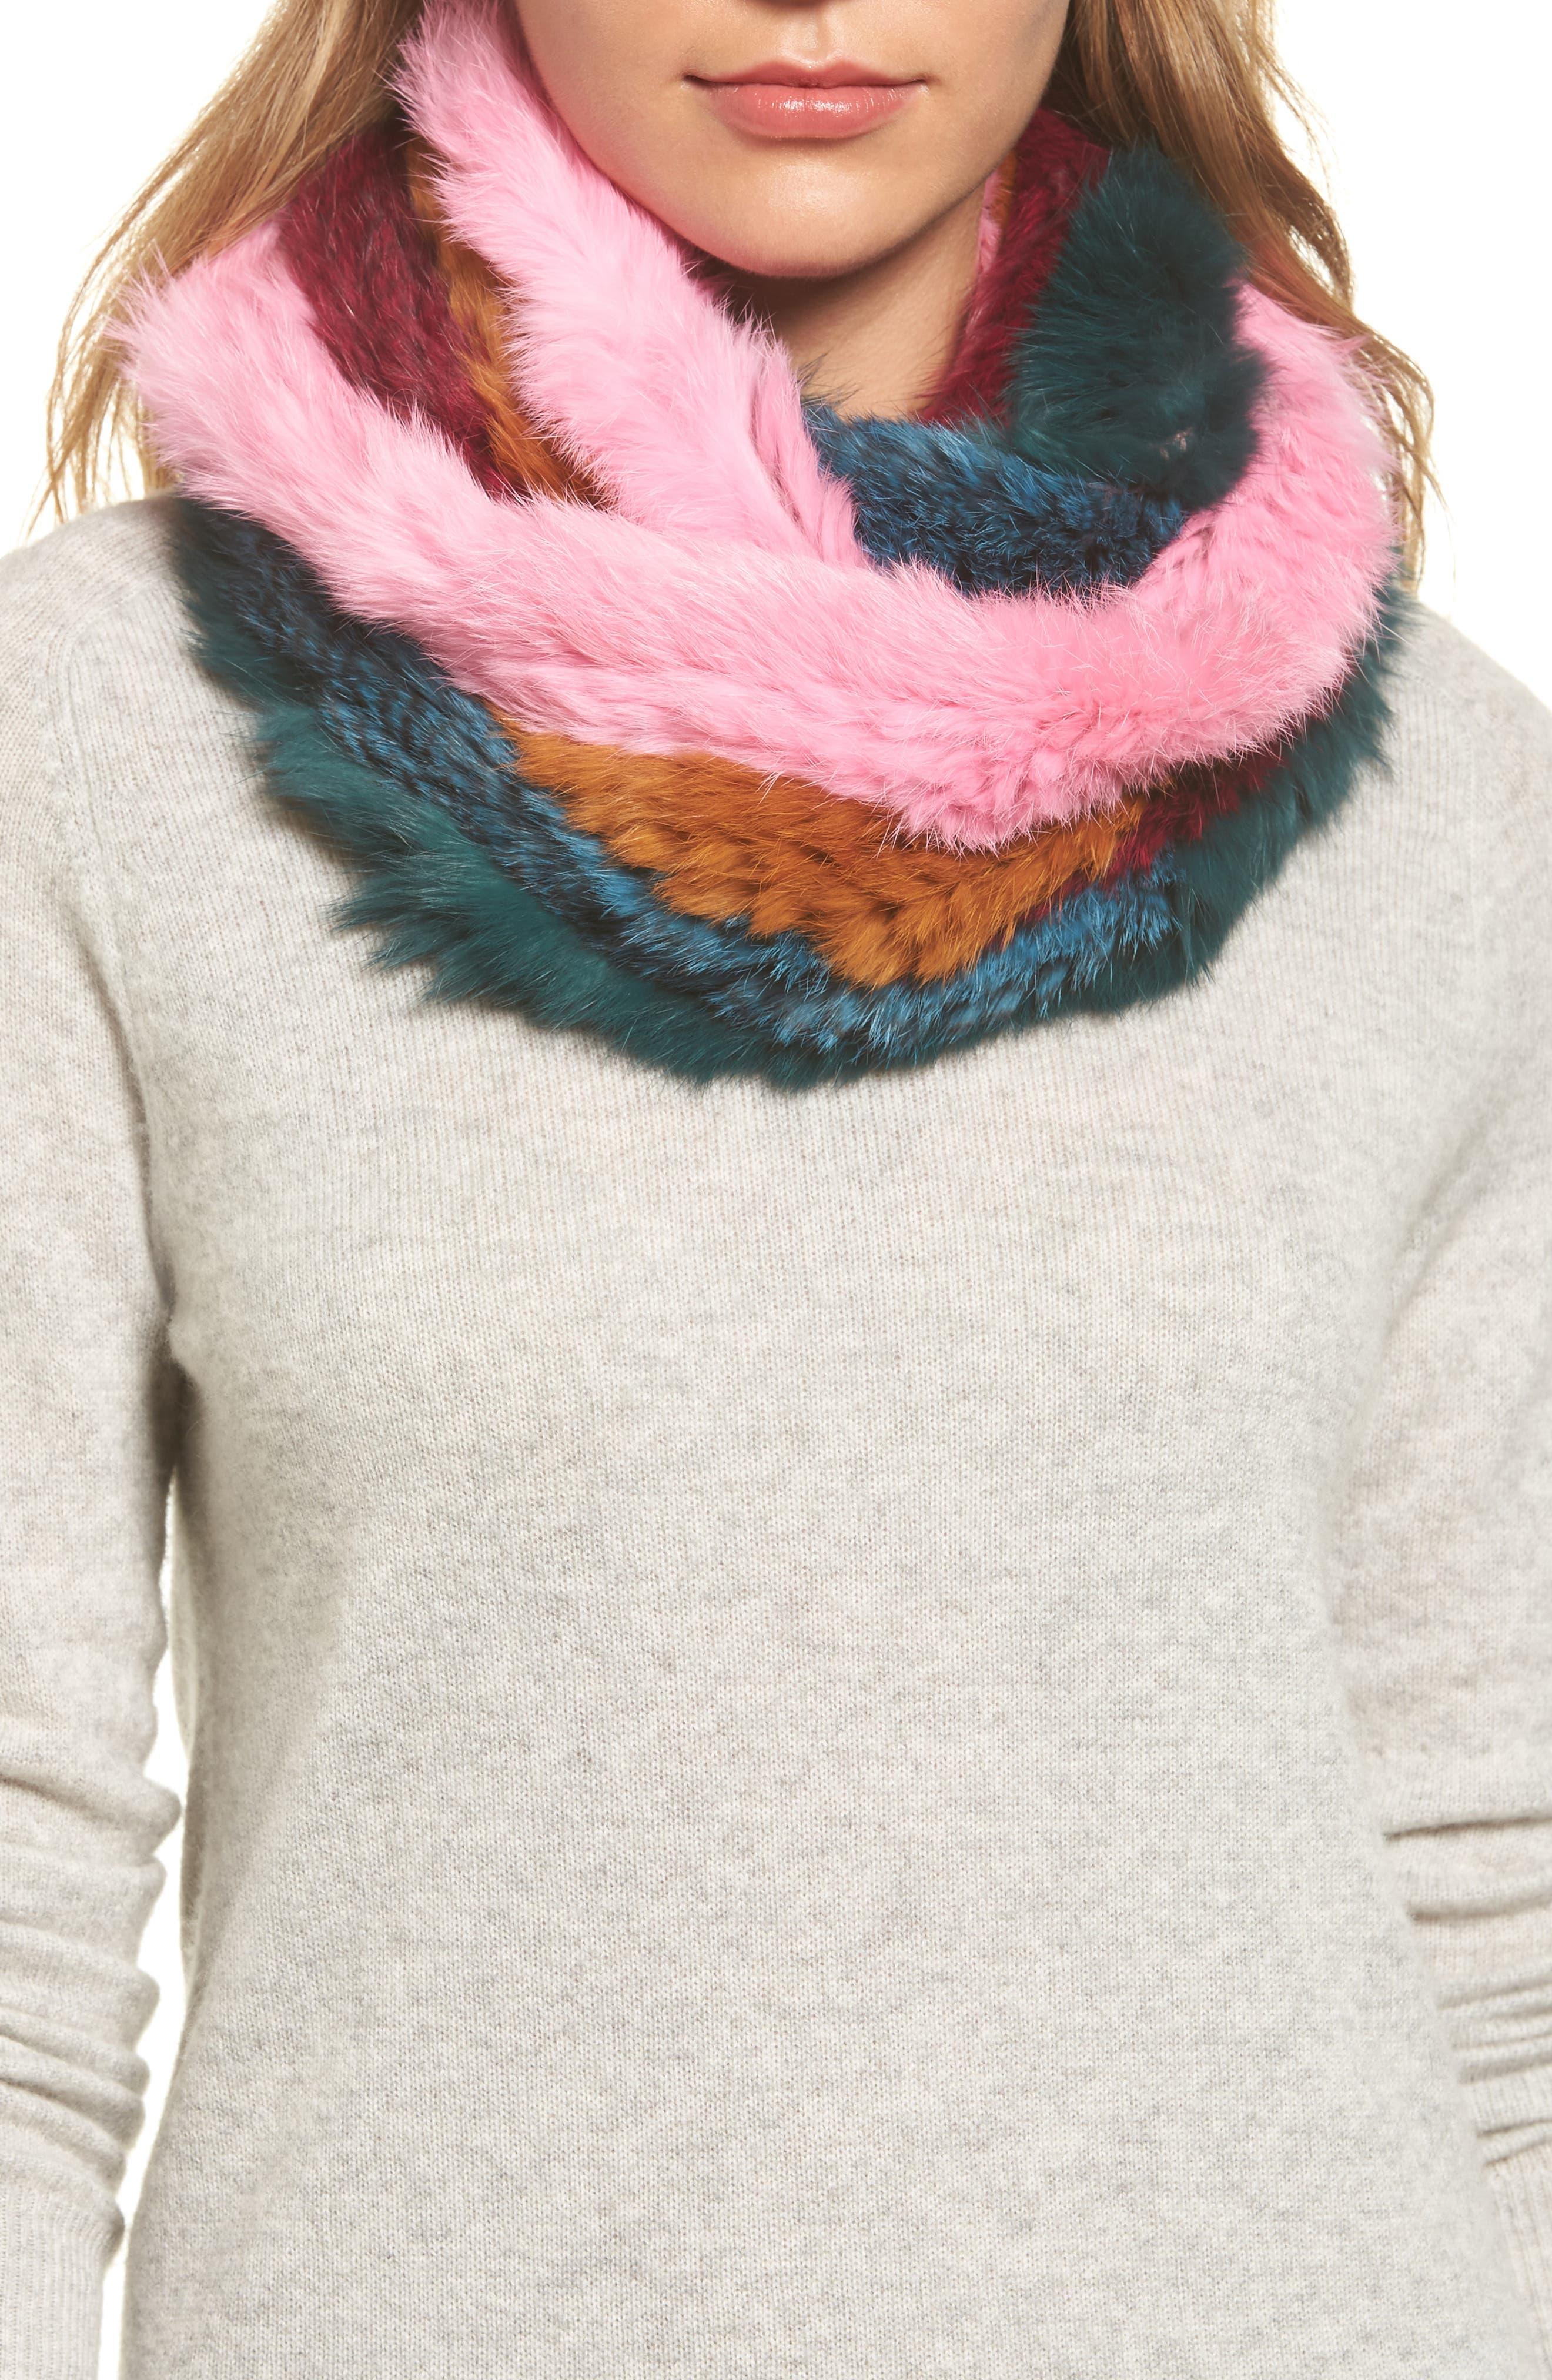 Main Image - Jocelyn Striped Genuine Rabbit Fur Infinity Scarf